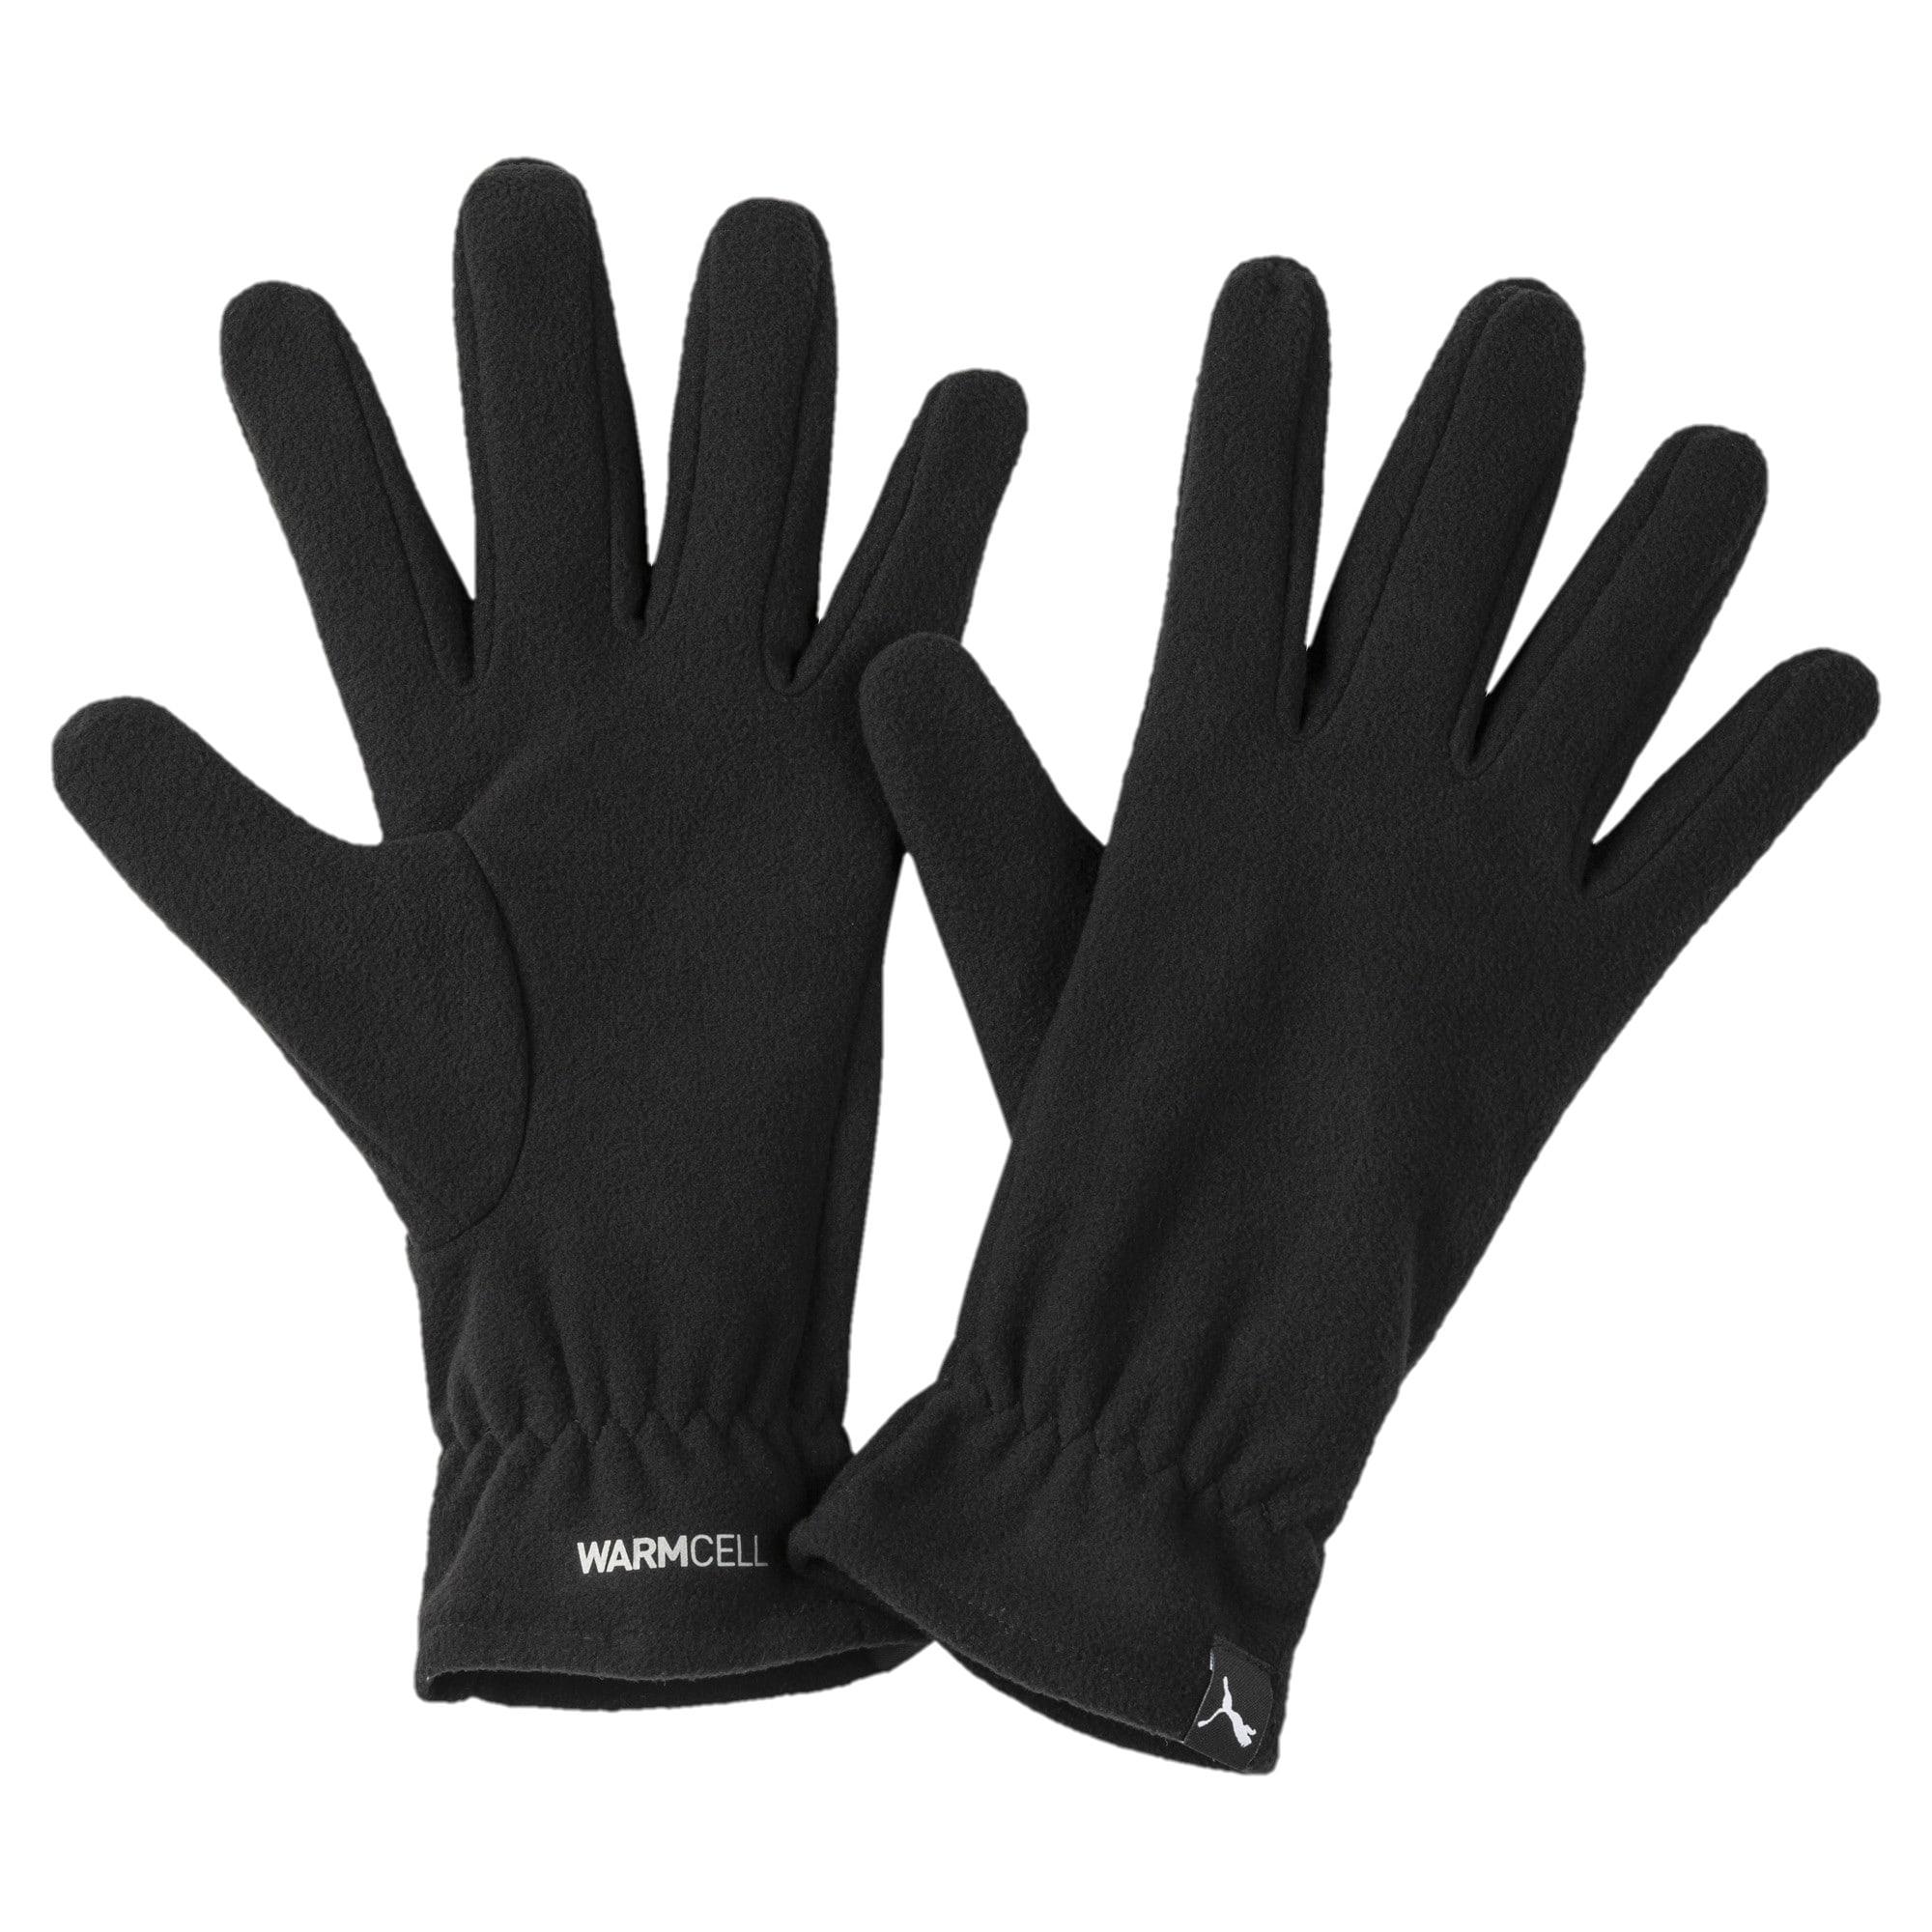 Thumbnail 1 of warmCELL Fleece Handschuhe, Puma Black, medium